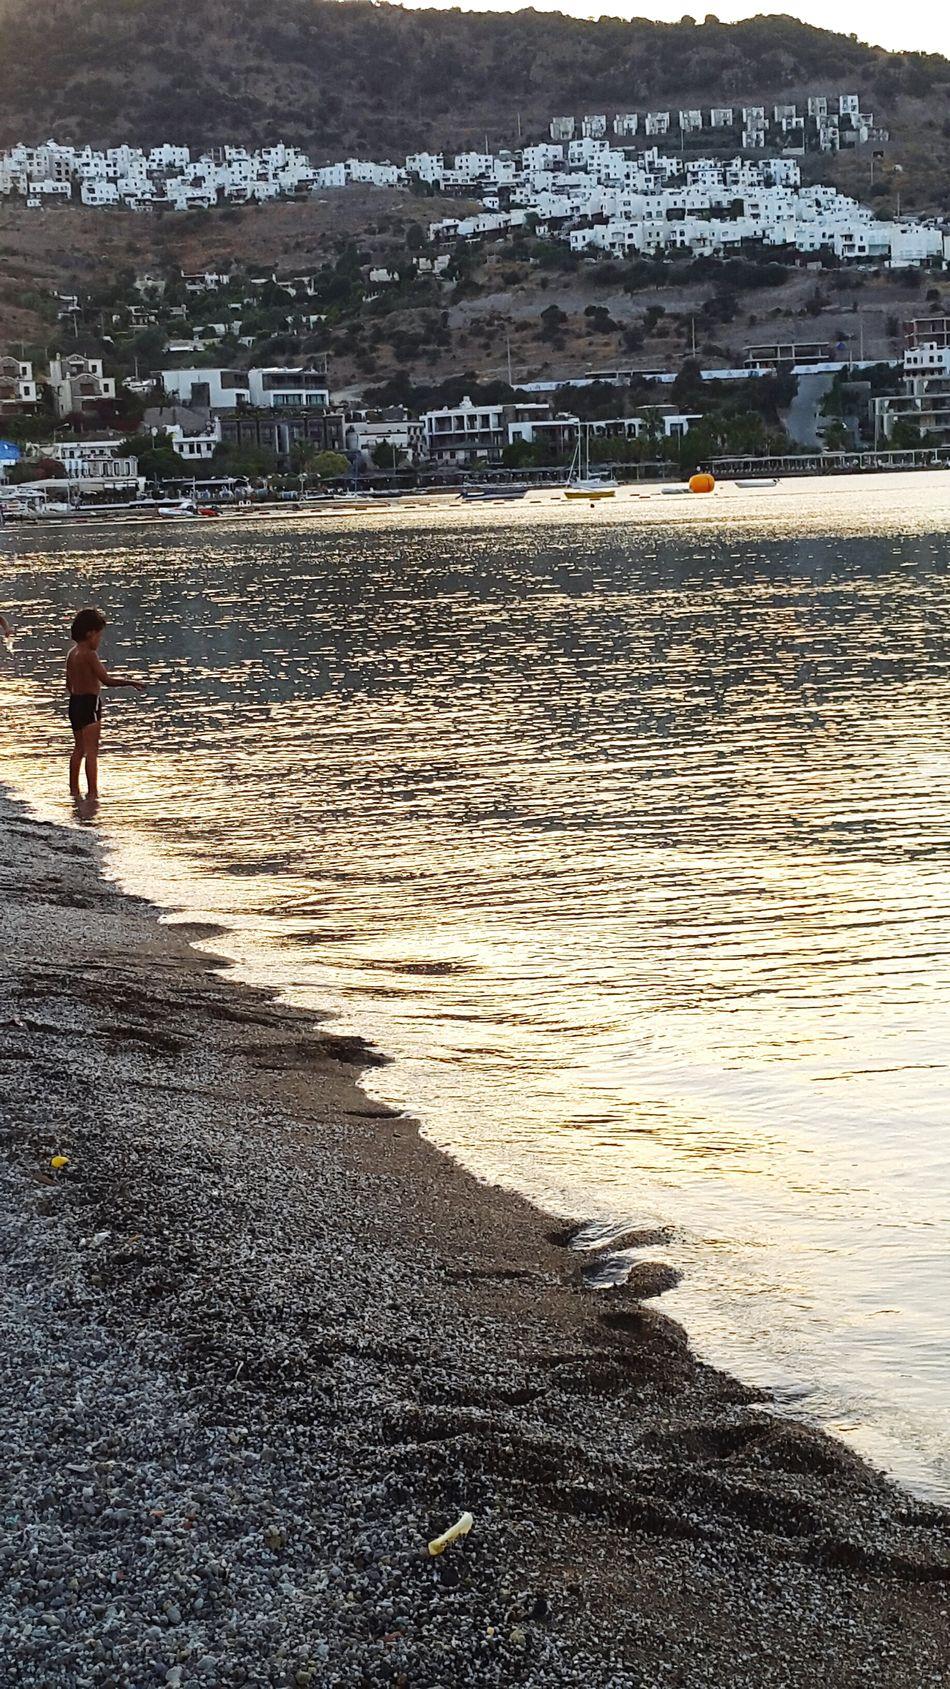 Enjoying Life Taking Photos Relaxing Sea Sunset Child Beach Wiev Bodrum's Houses Bodrum, Turkey First Eyeem Photo